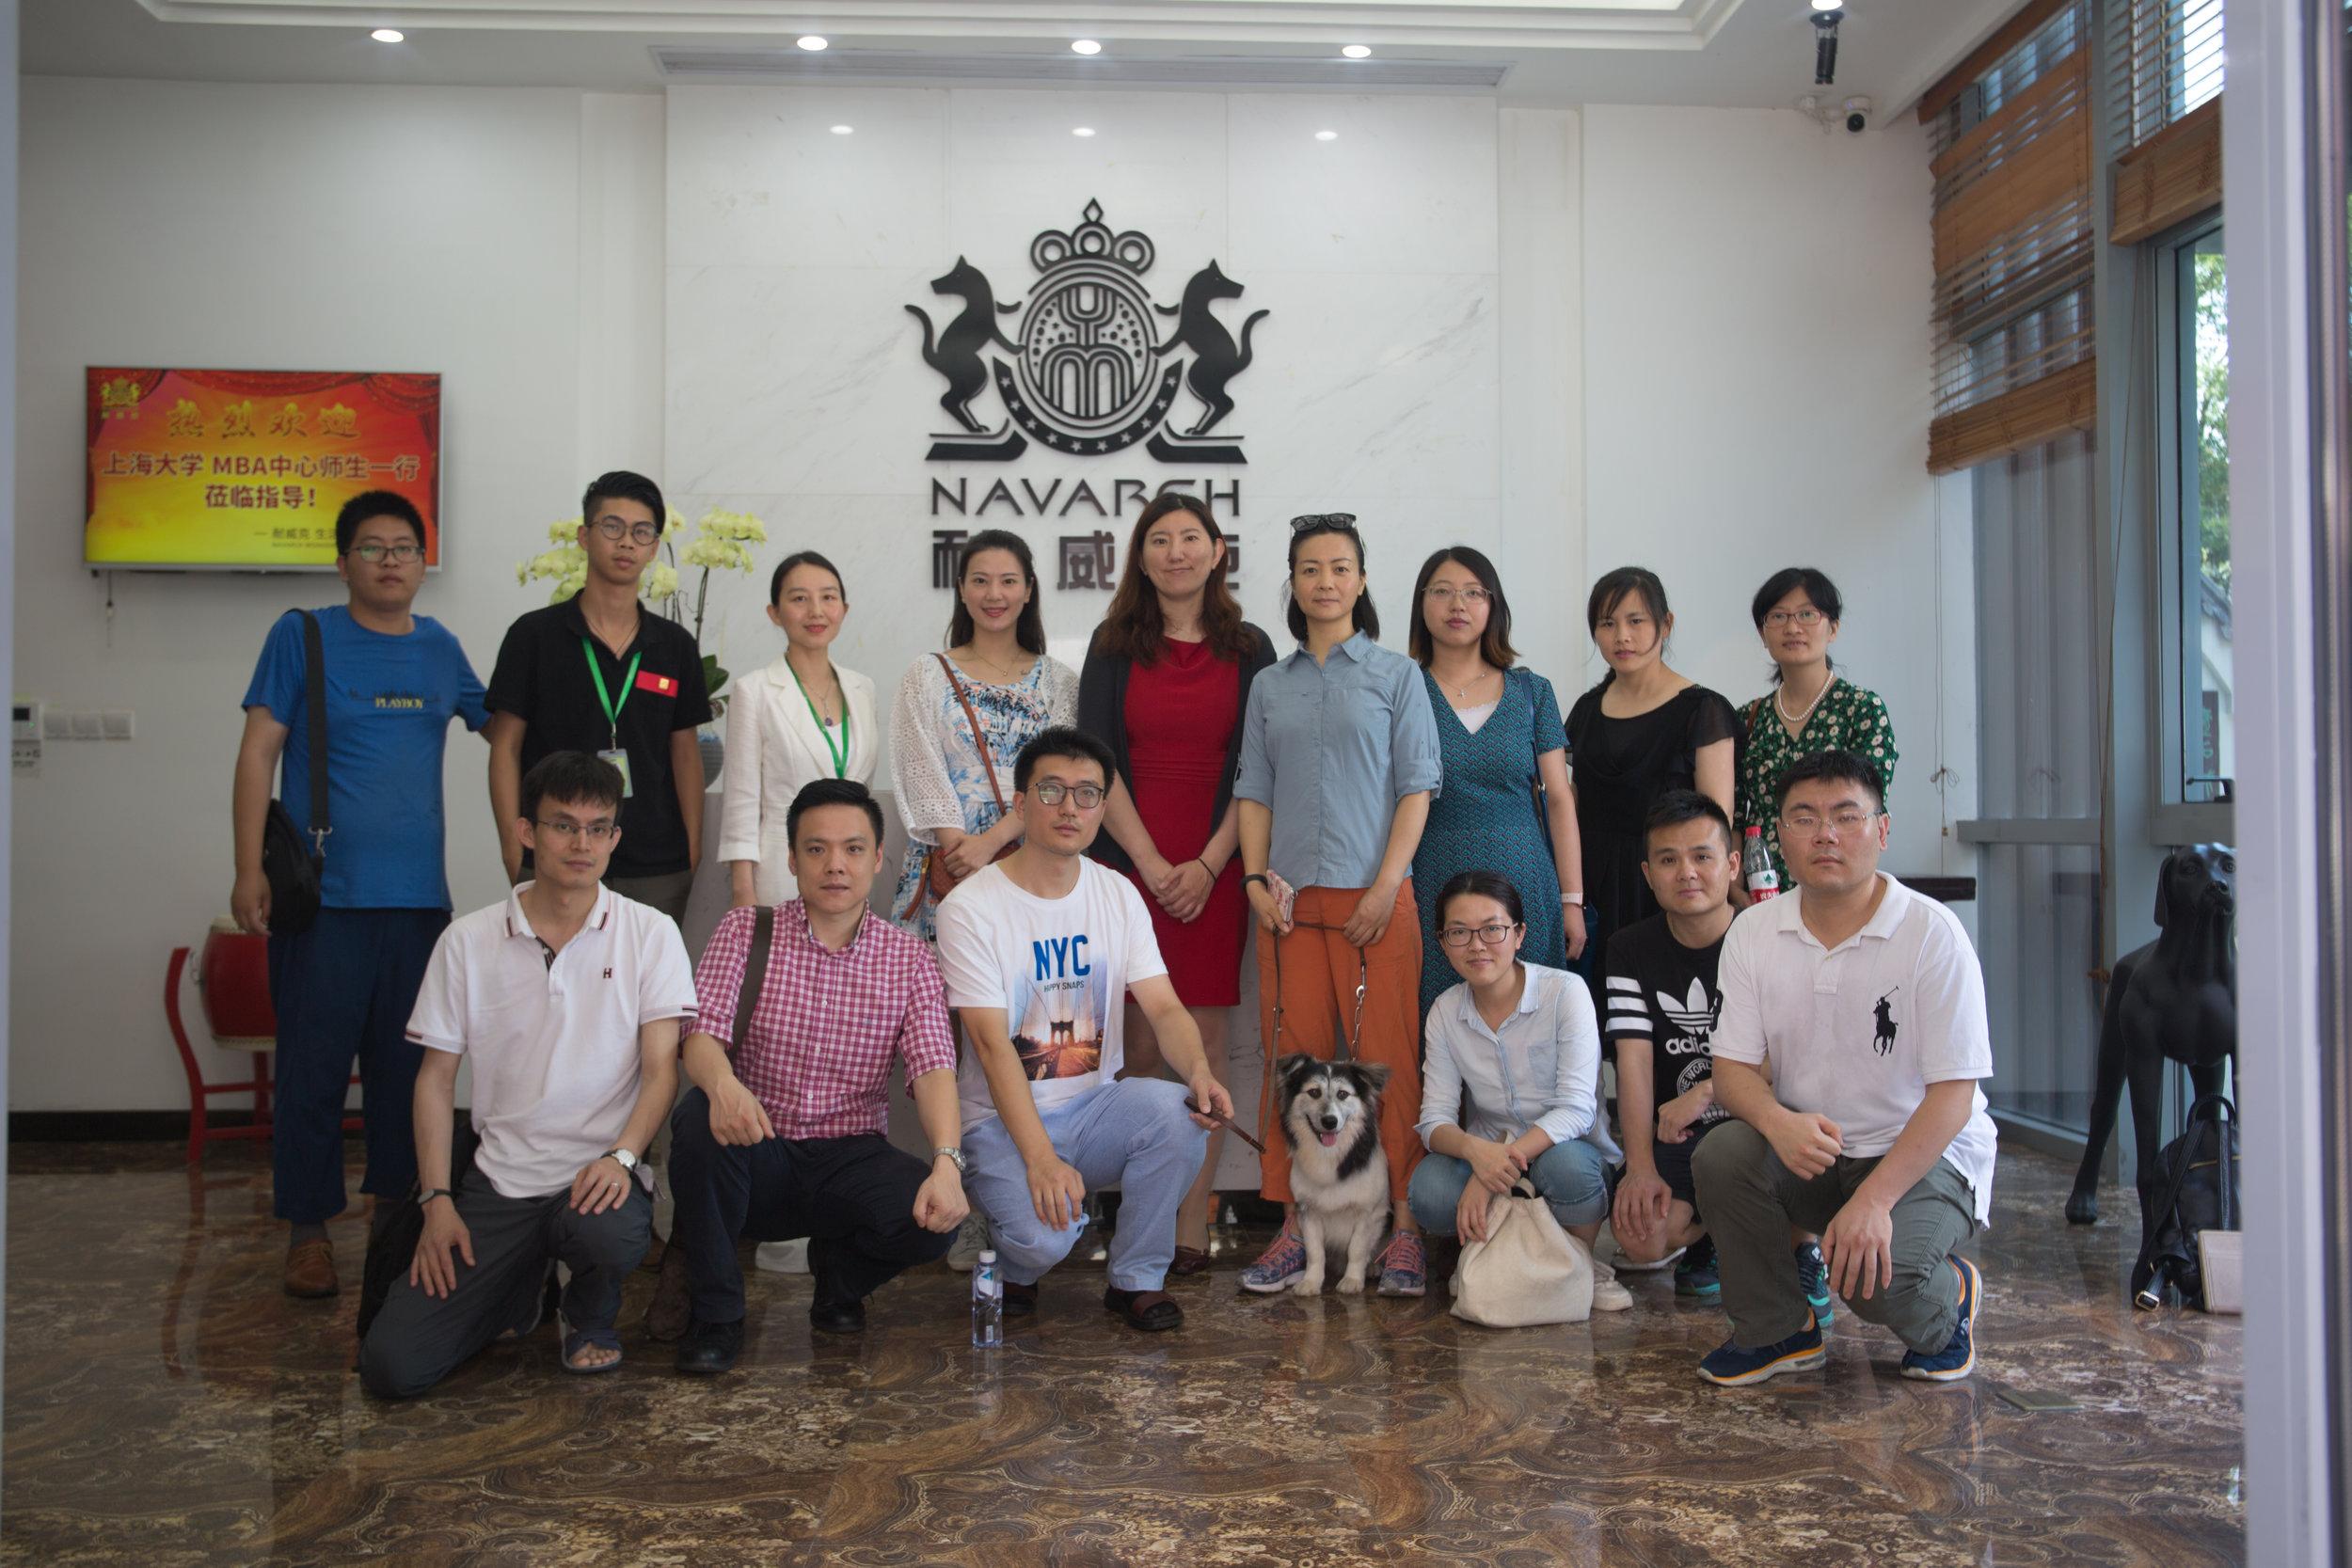 visit Navarch pet supplies company.jpg